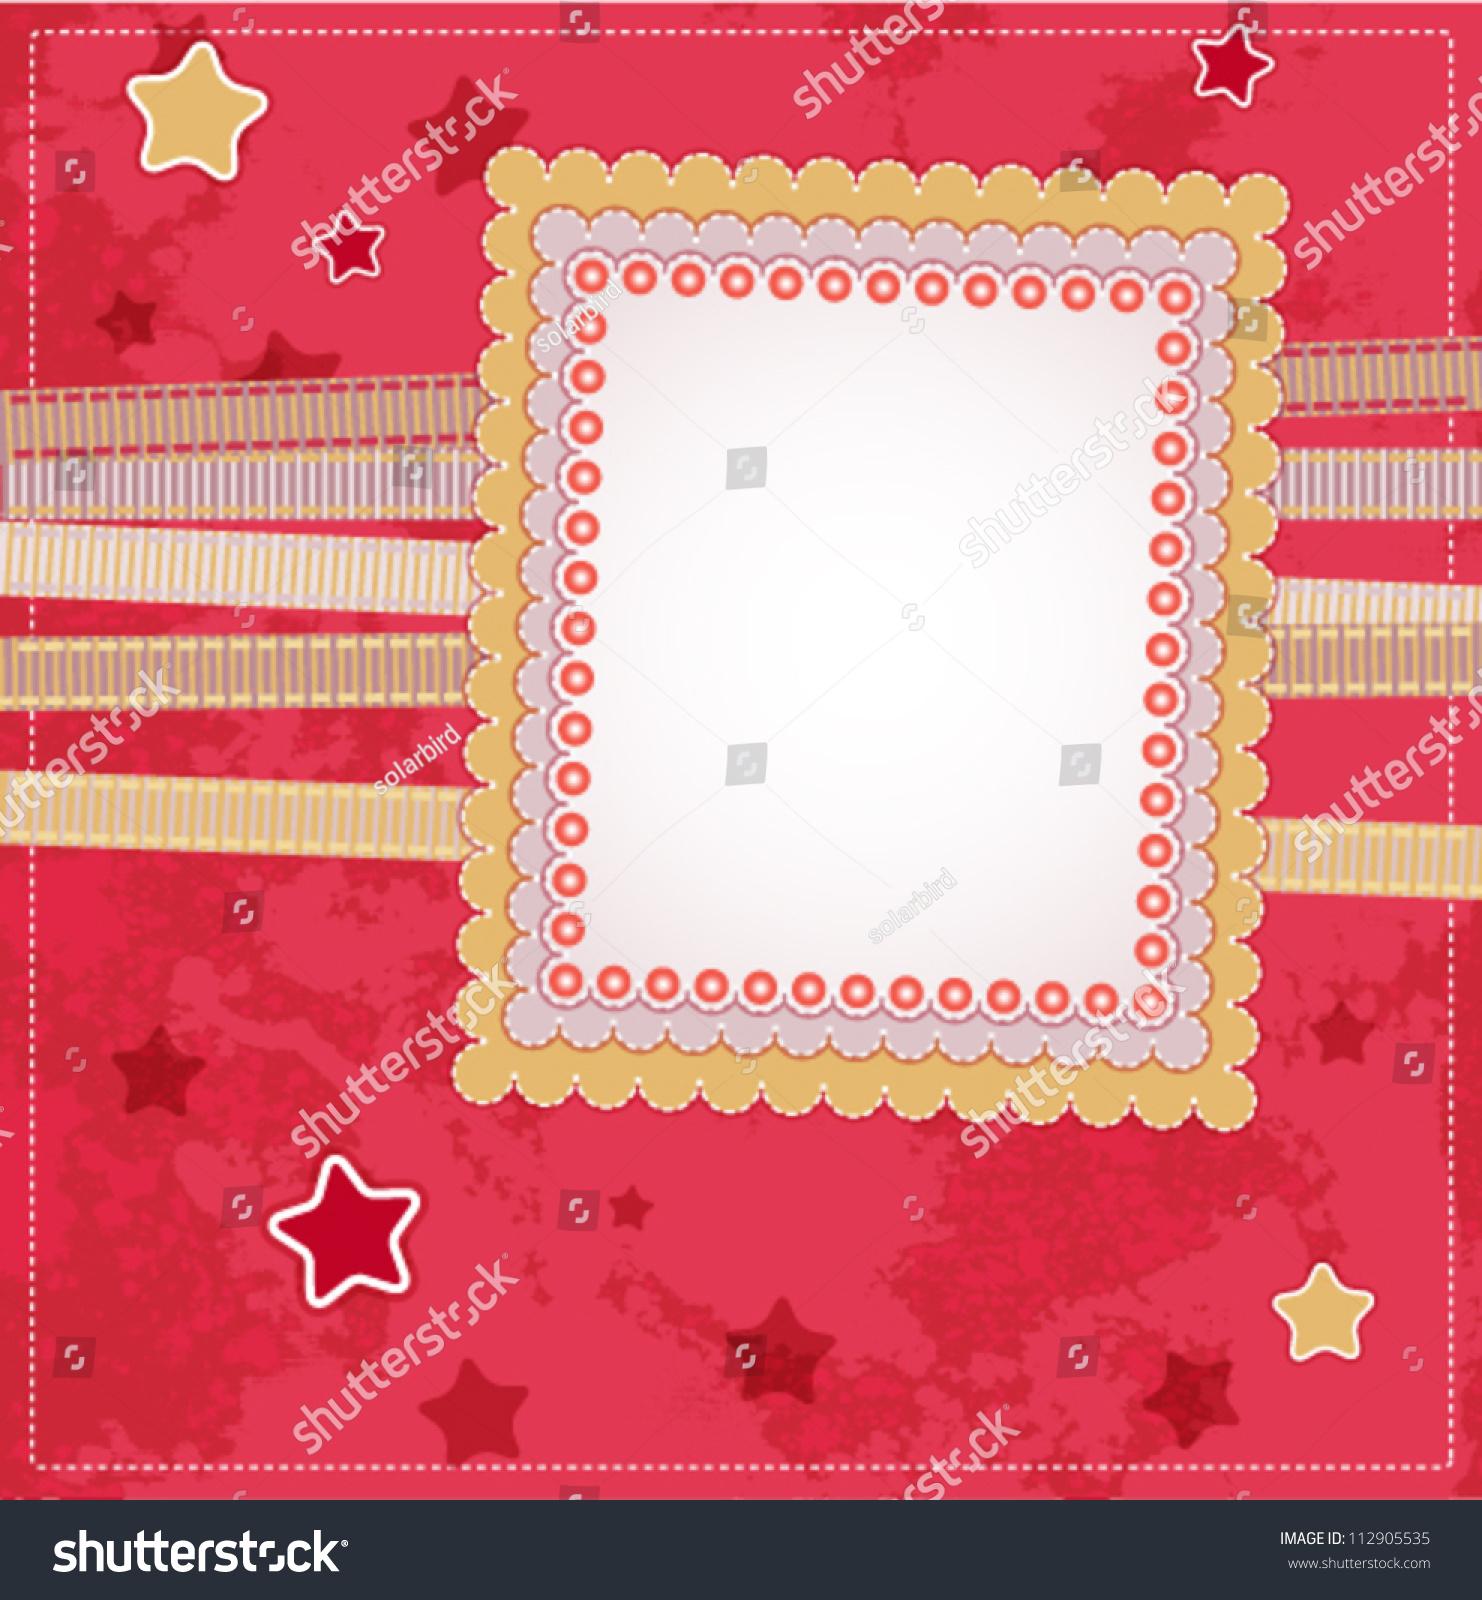 Romantic Scrapbook For Invitation, Greeting, Happy